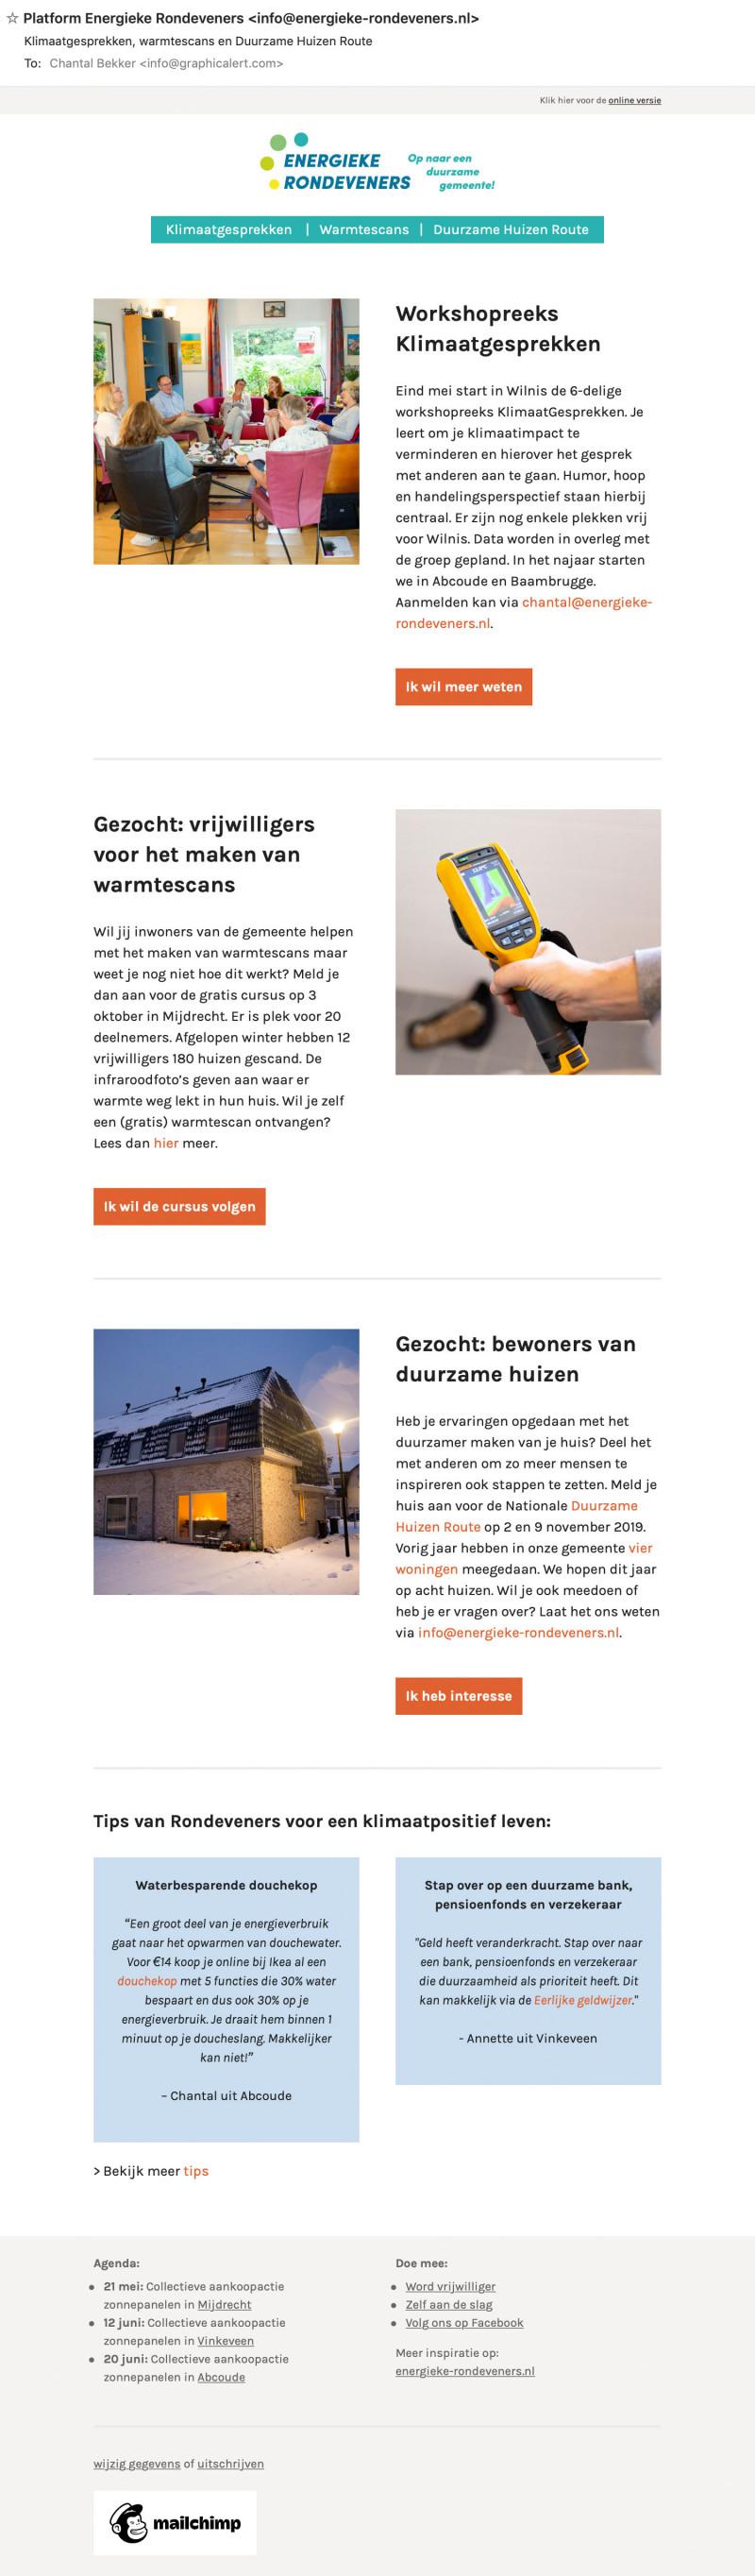 nieuwsbrief-duurzame-gemeente-energieke-rondeveners-abcoude